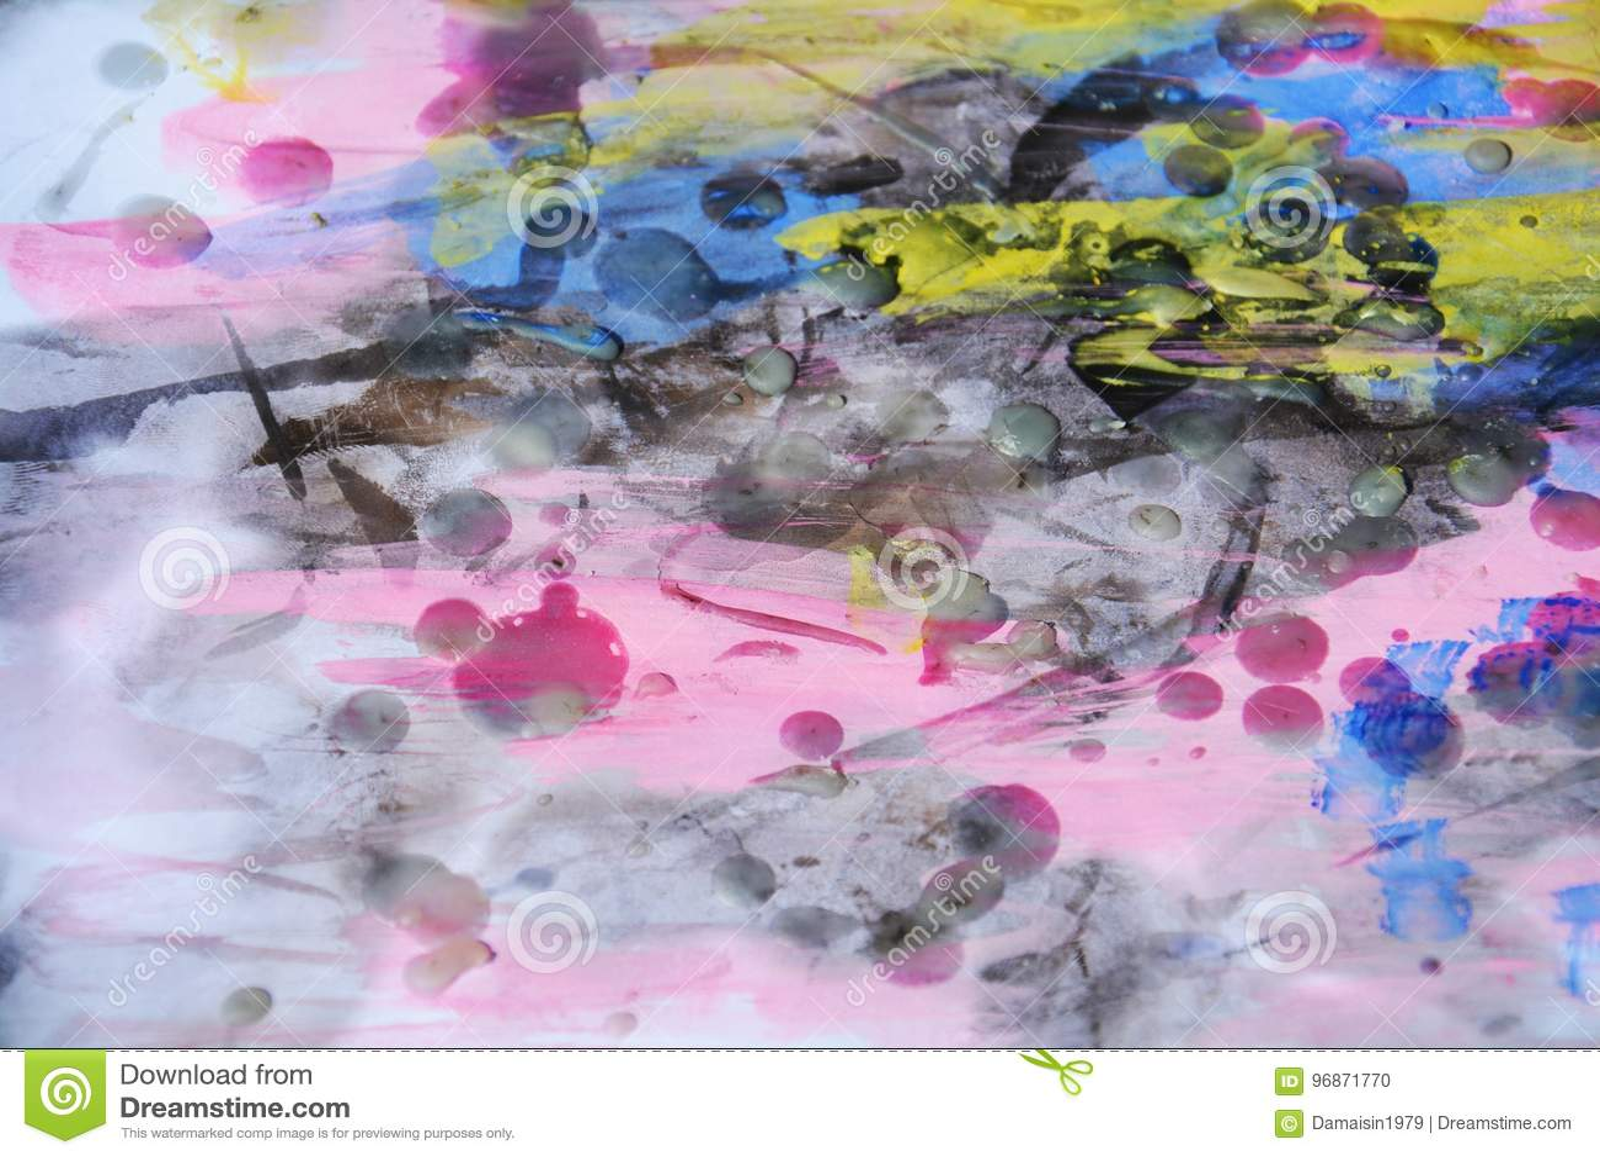 Wasachtige violette waterverf abstracte achtergrond in levendige tinten